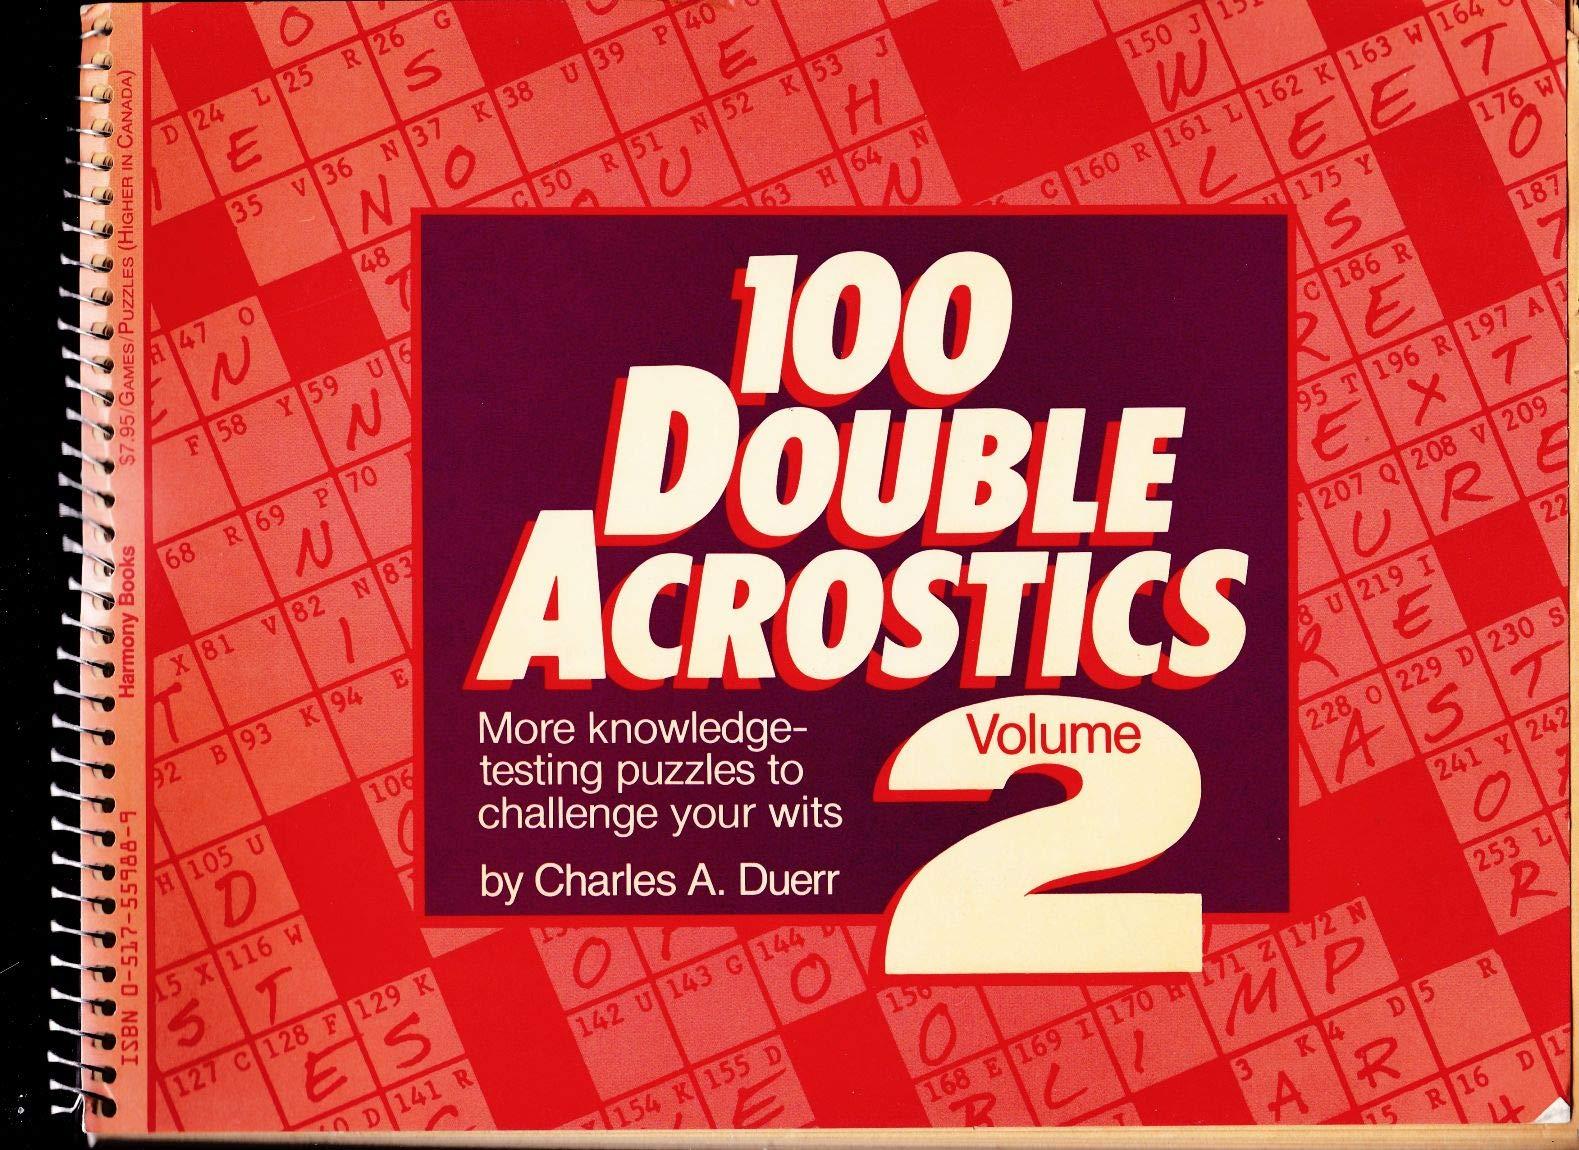 Volume 3 Random House Crostics